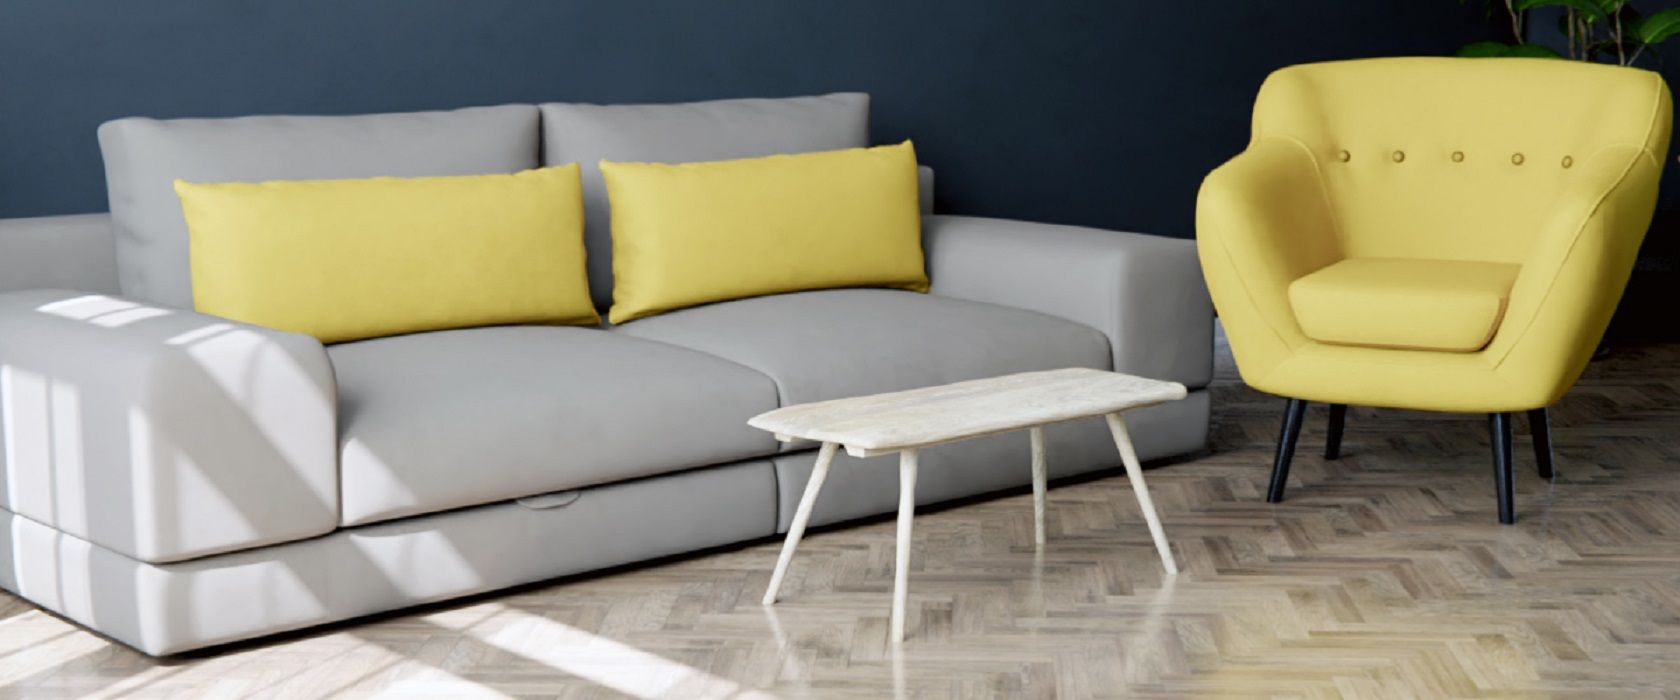 Трехместный диван Dario - Фото 2 - Pufetto